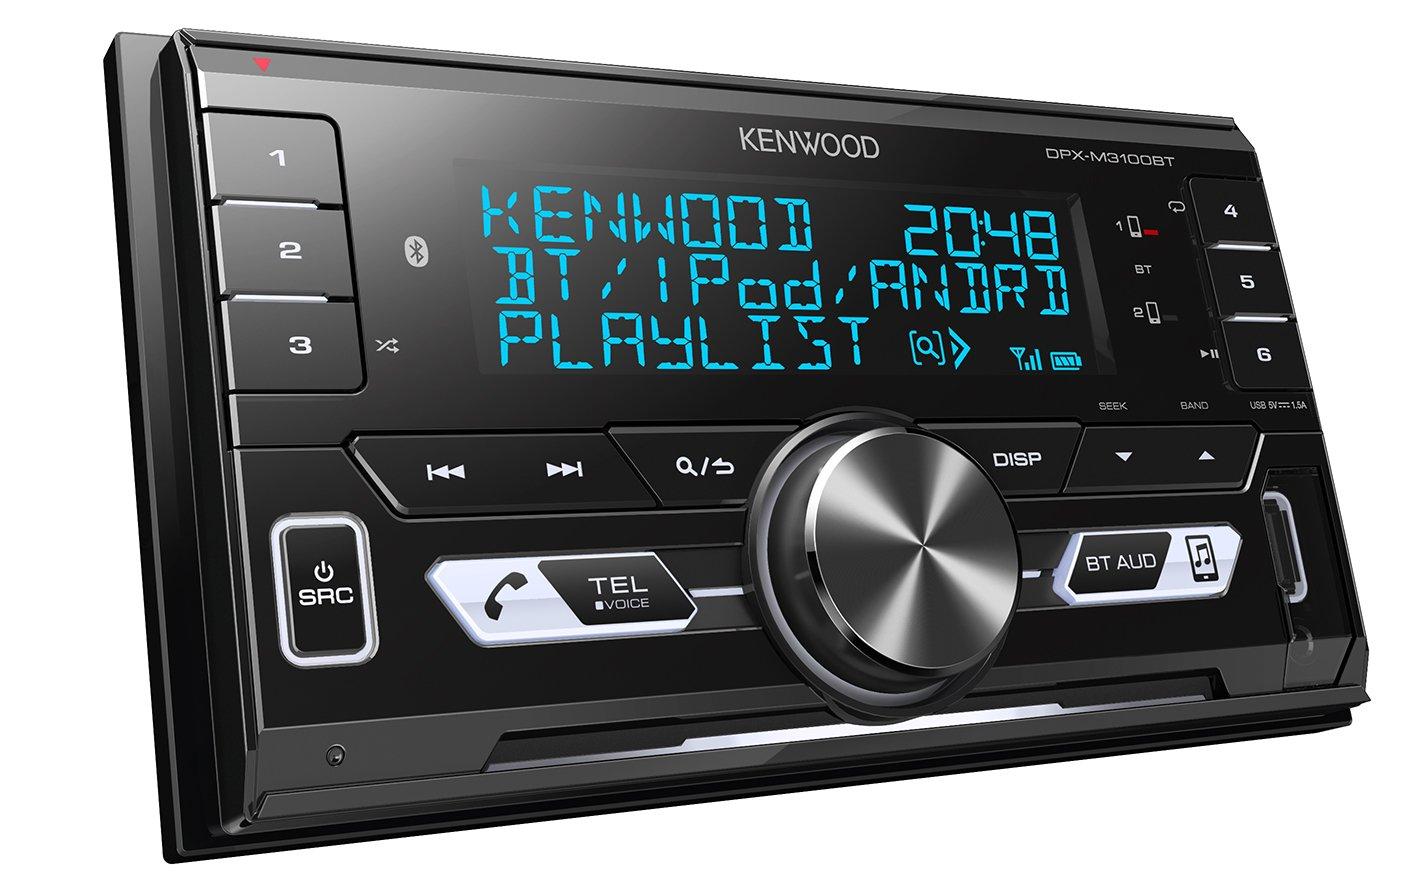 Kenwood-DPX-M3100BT-Doppel-DIN-Receiver